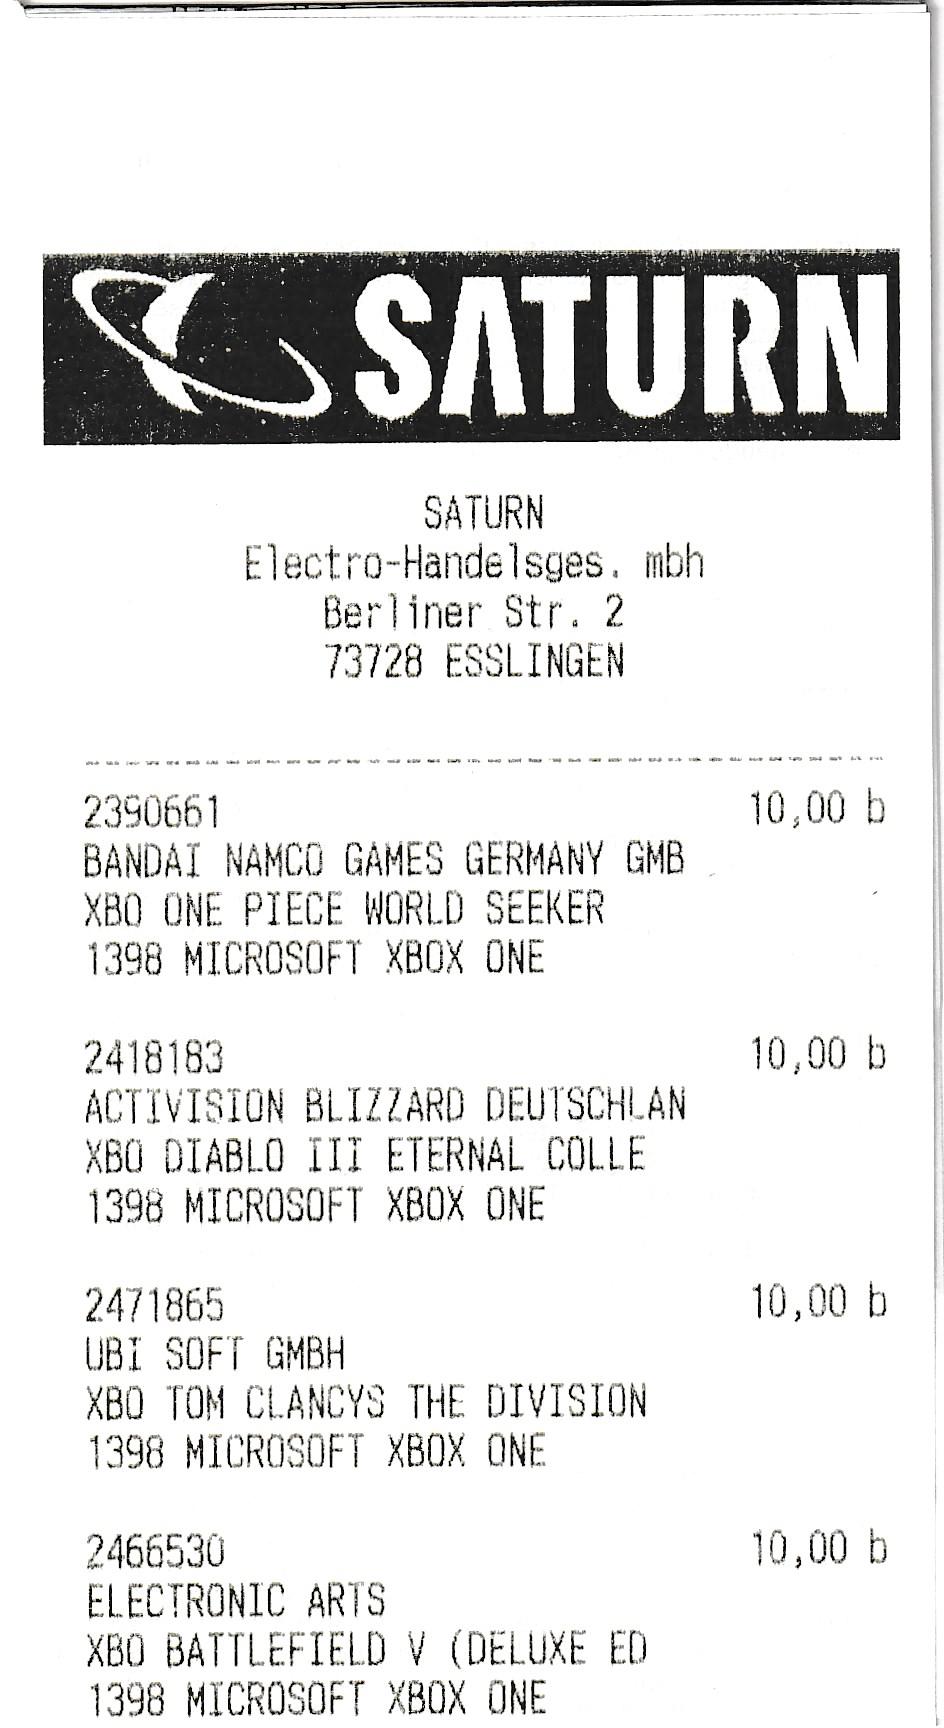 [Lokal] Saturn Esslingen - Zahlreiche Xbox One Spiele für 10 € [u.a. Division 2/One Piece World Seeker/FarCry New Dawn/CoD BO4, Sekiro,...]